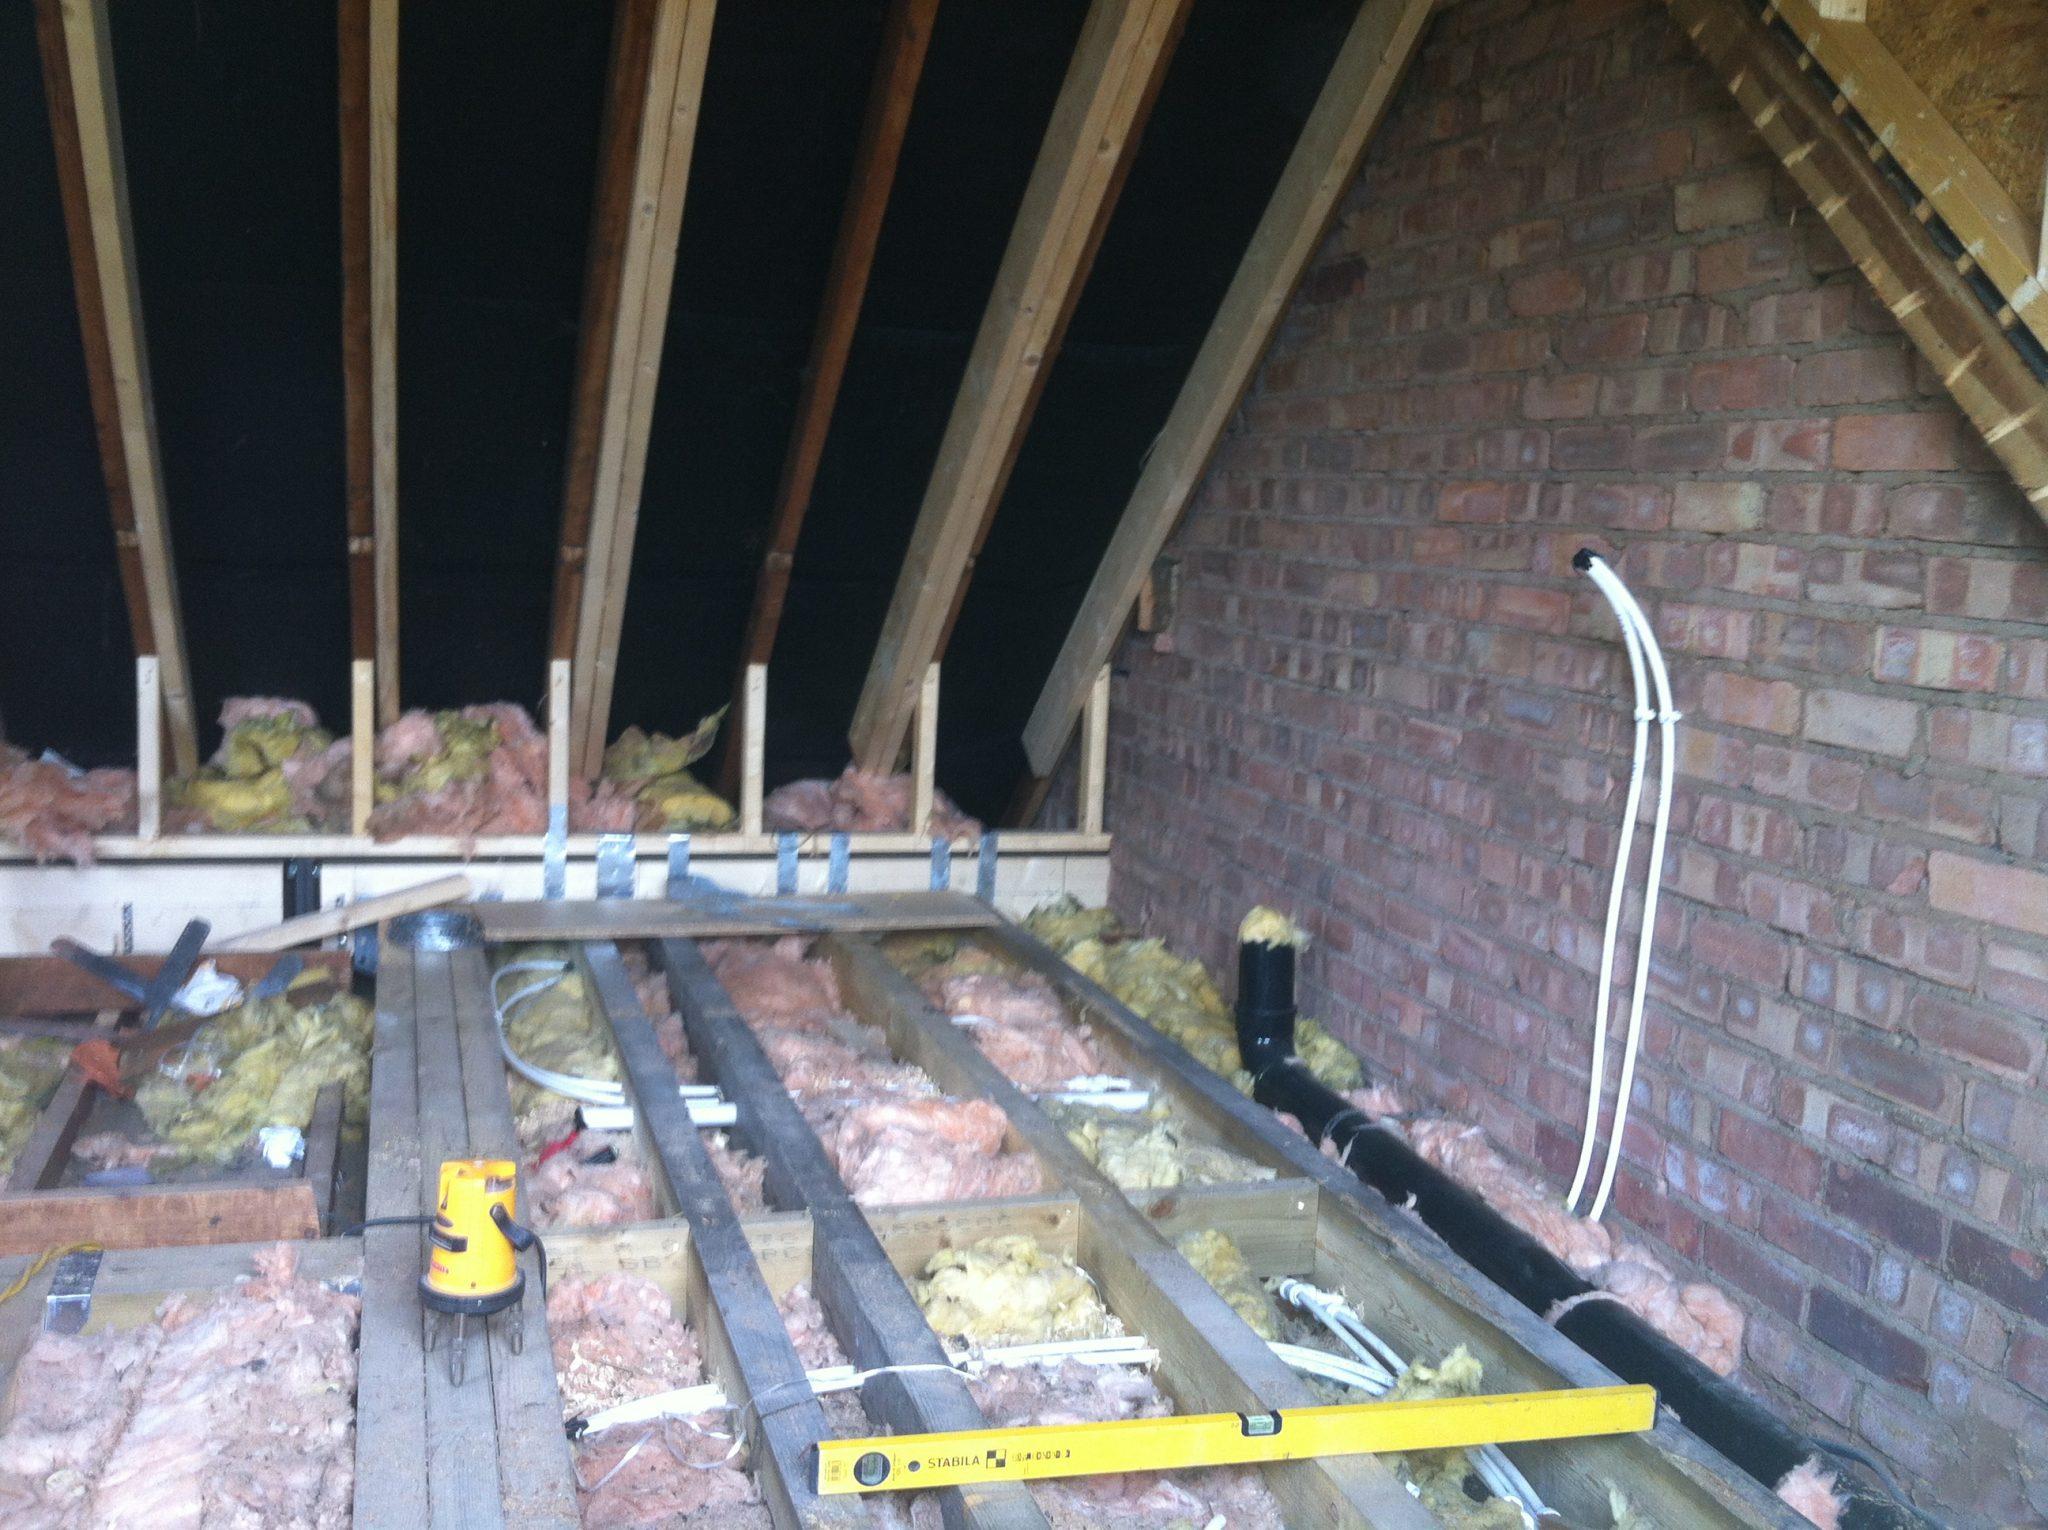 loft conversion ideas semi detached house - Loft Conversion Internal Shell